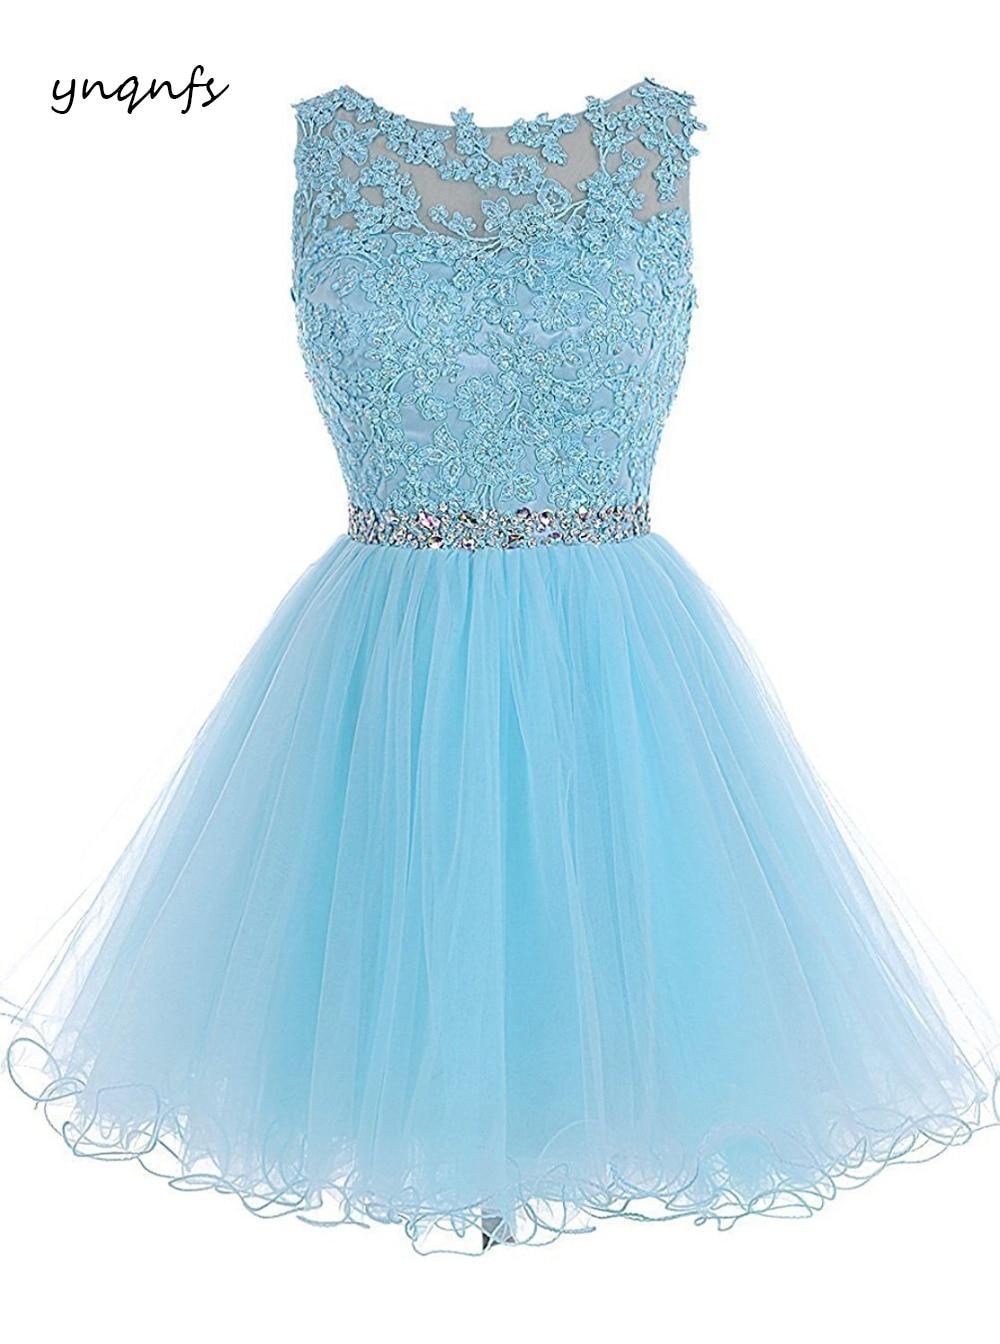 ynqnfs skirt short paragraph design multi-color increase dress elegant toast evening dress lace t554